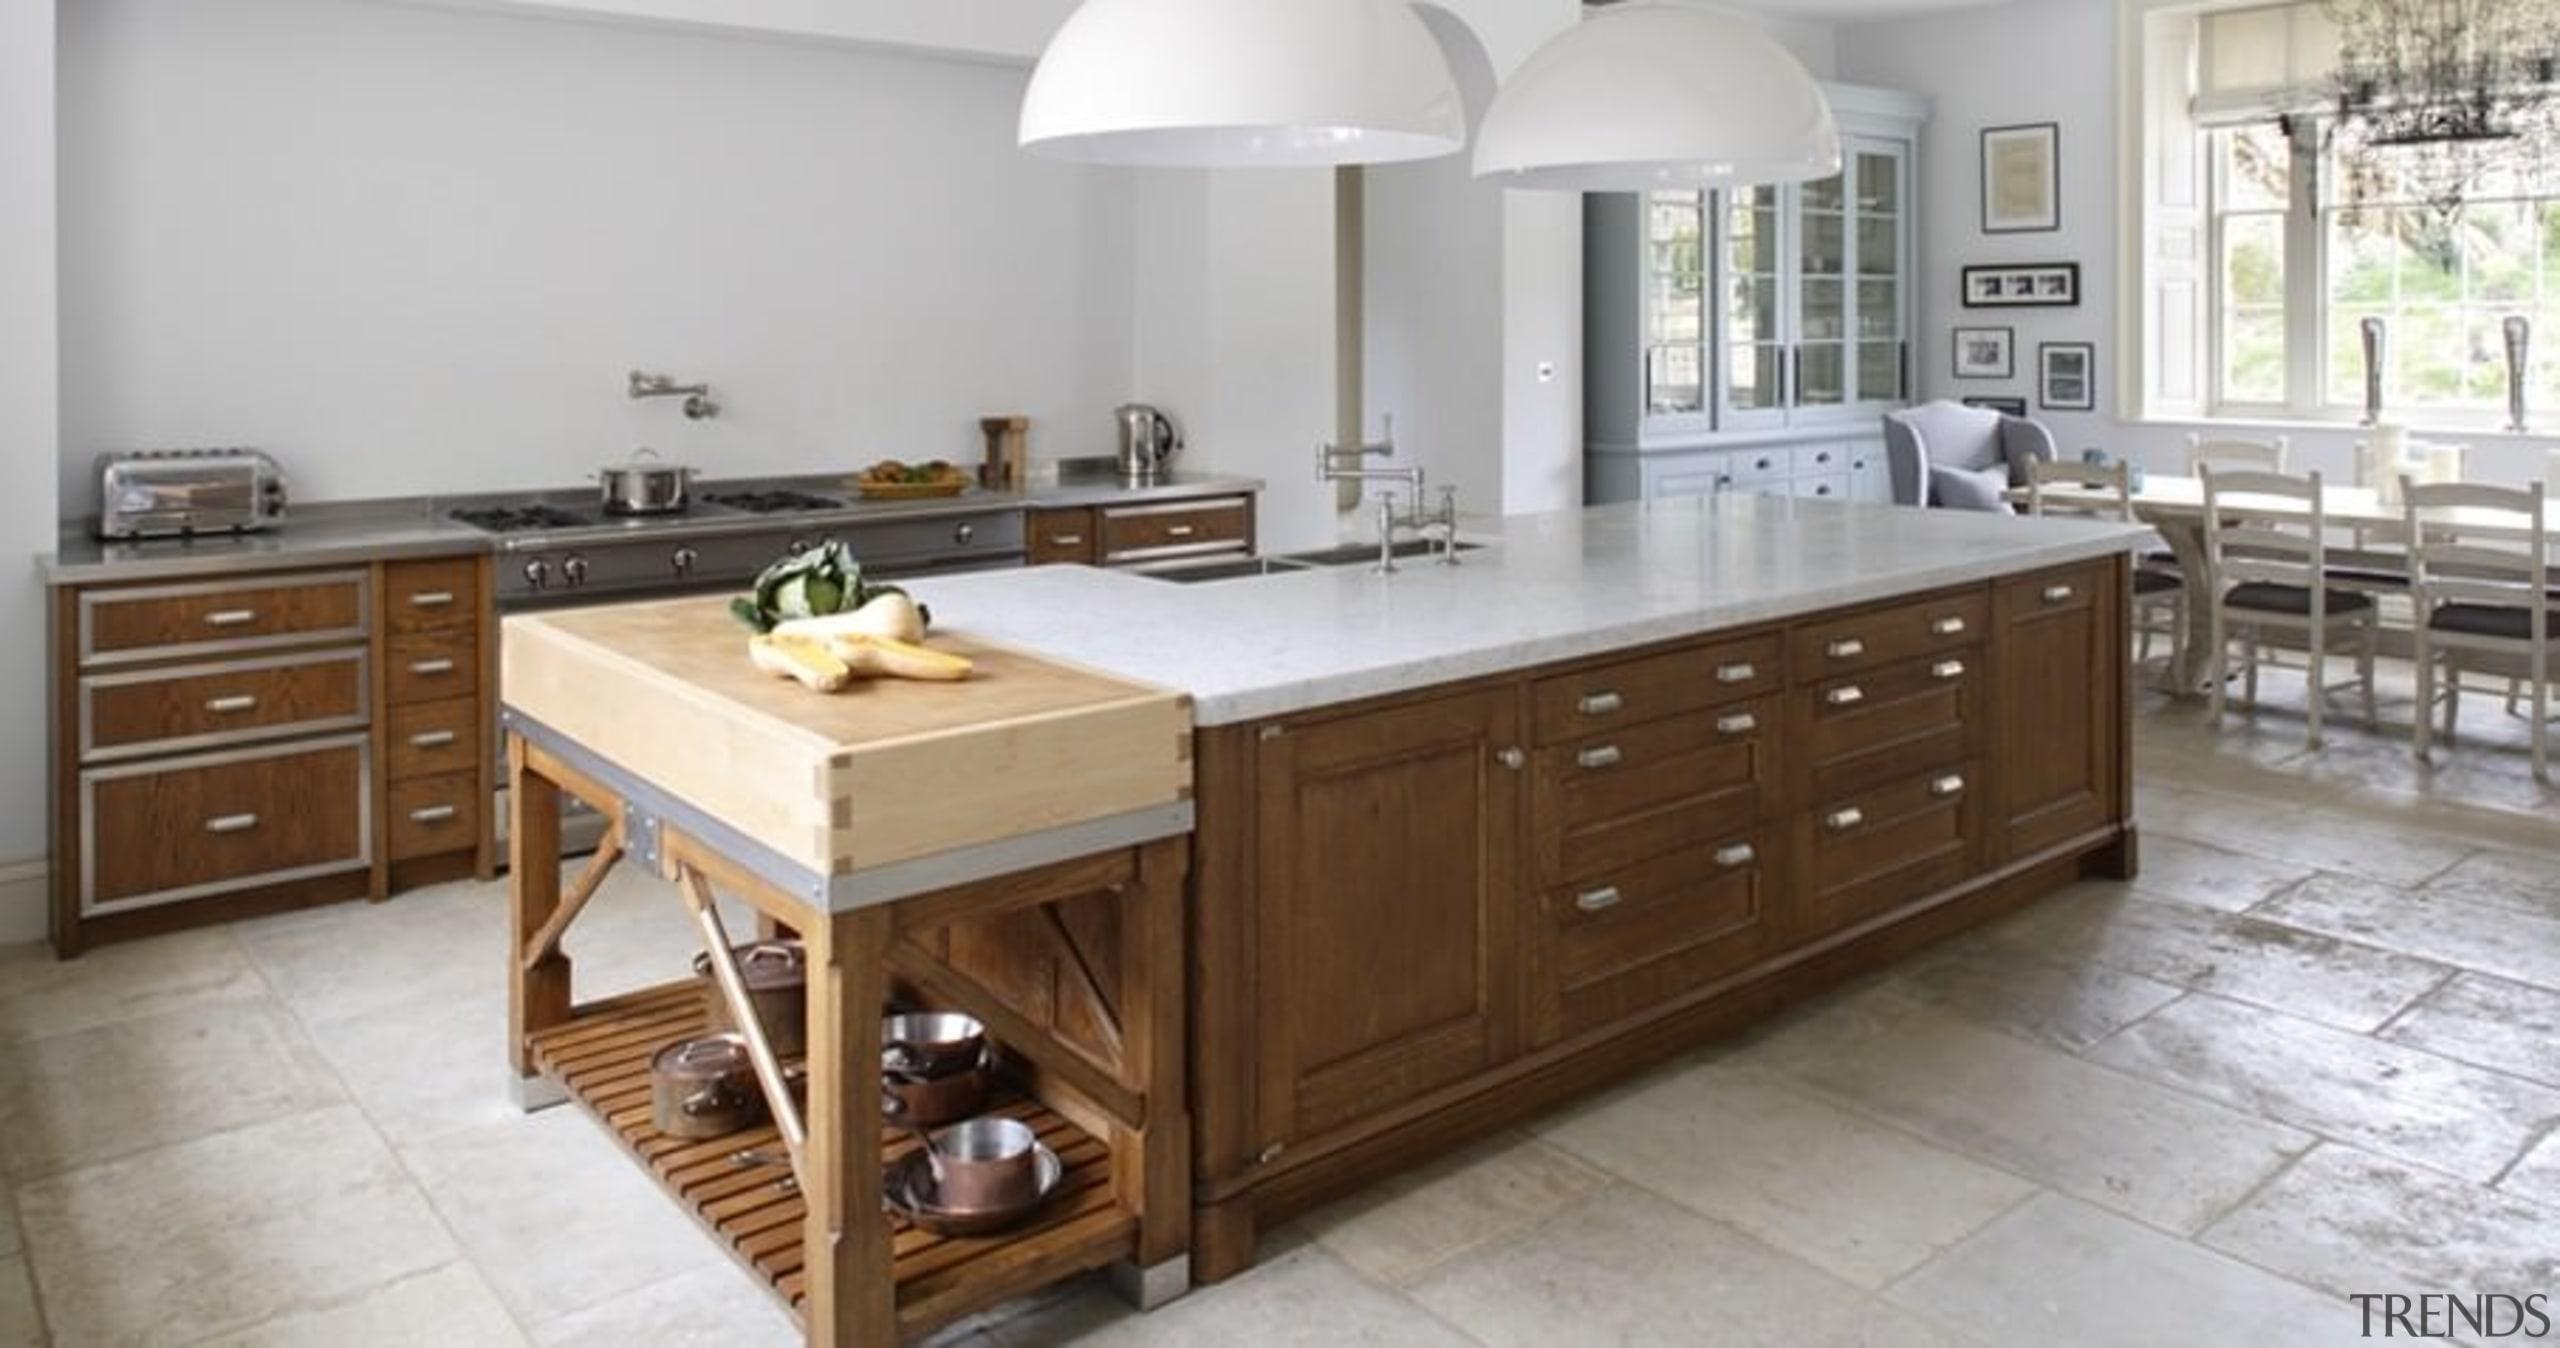 A traditional British kitchen - A traditional British cabinetry, countertop, cuisine classique, interior design, kitchen, room, gray